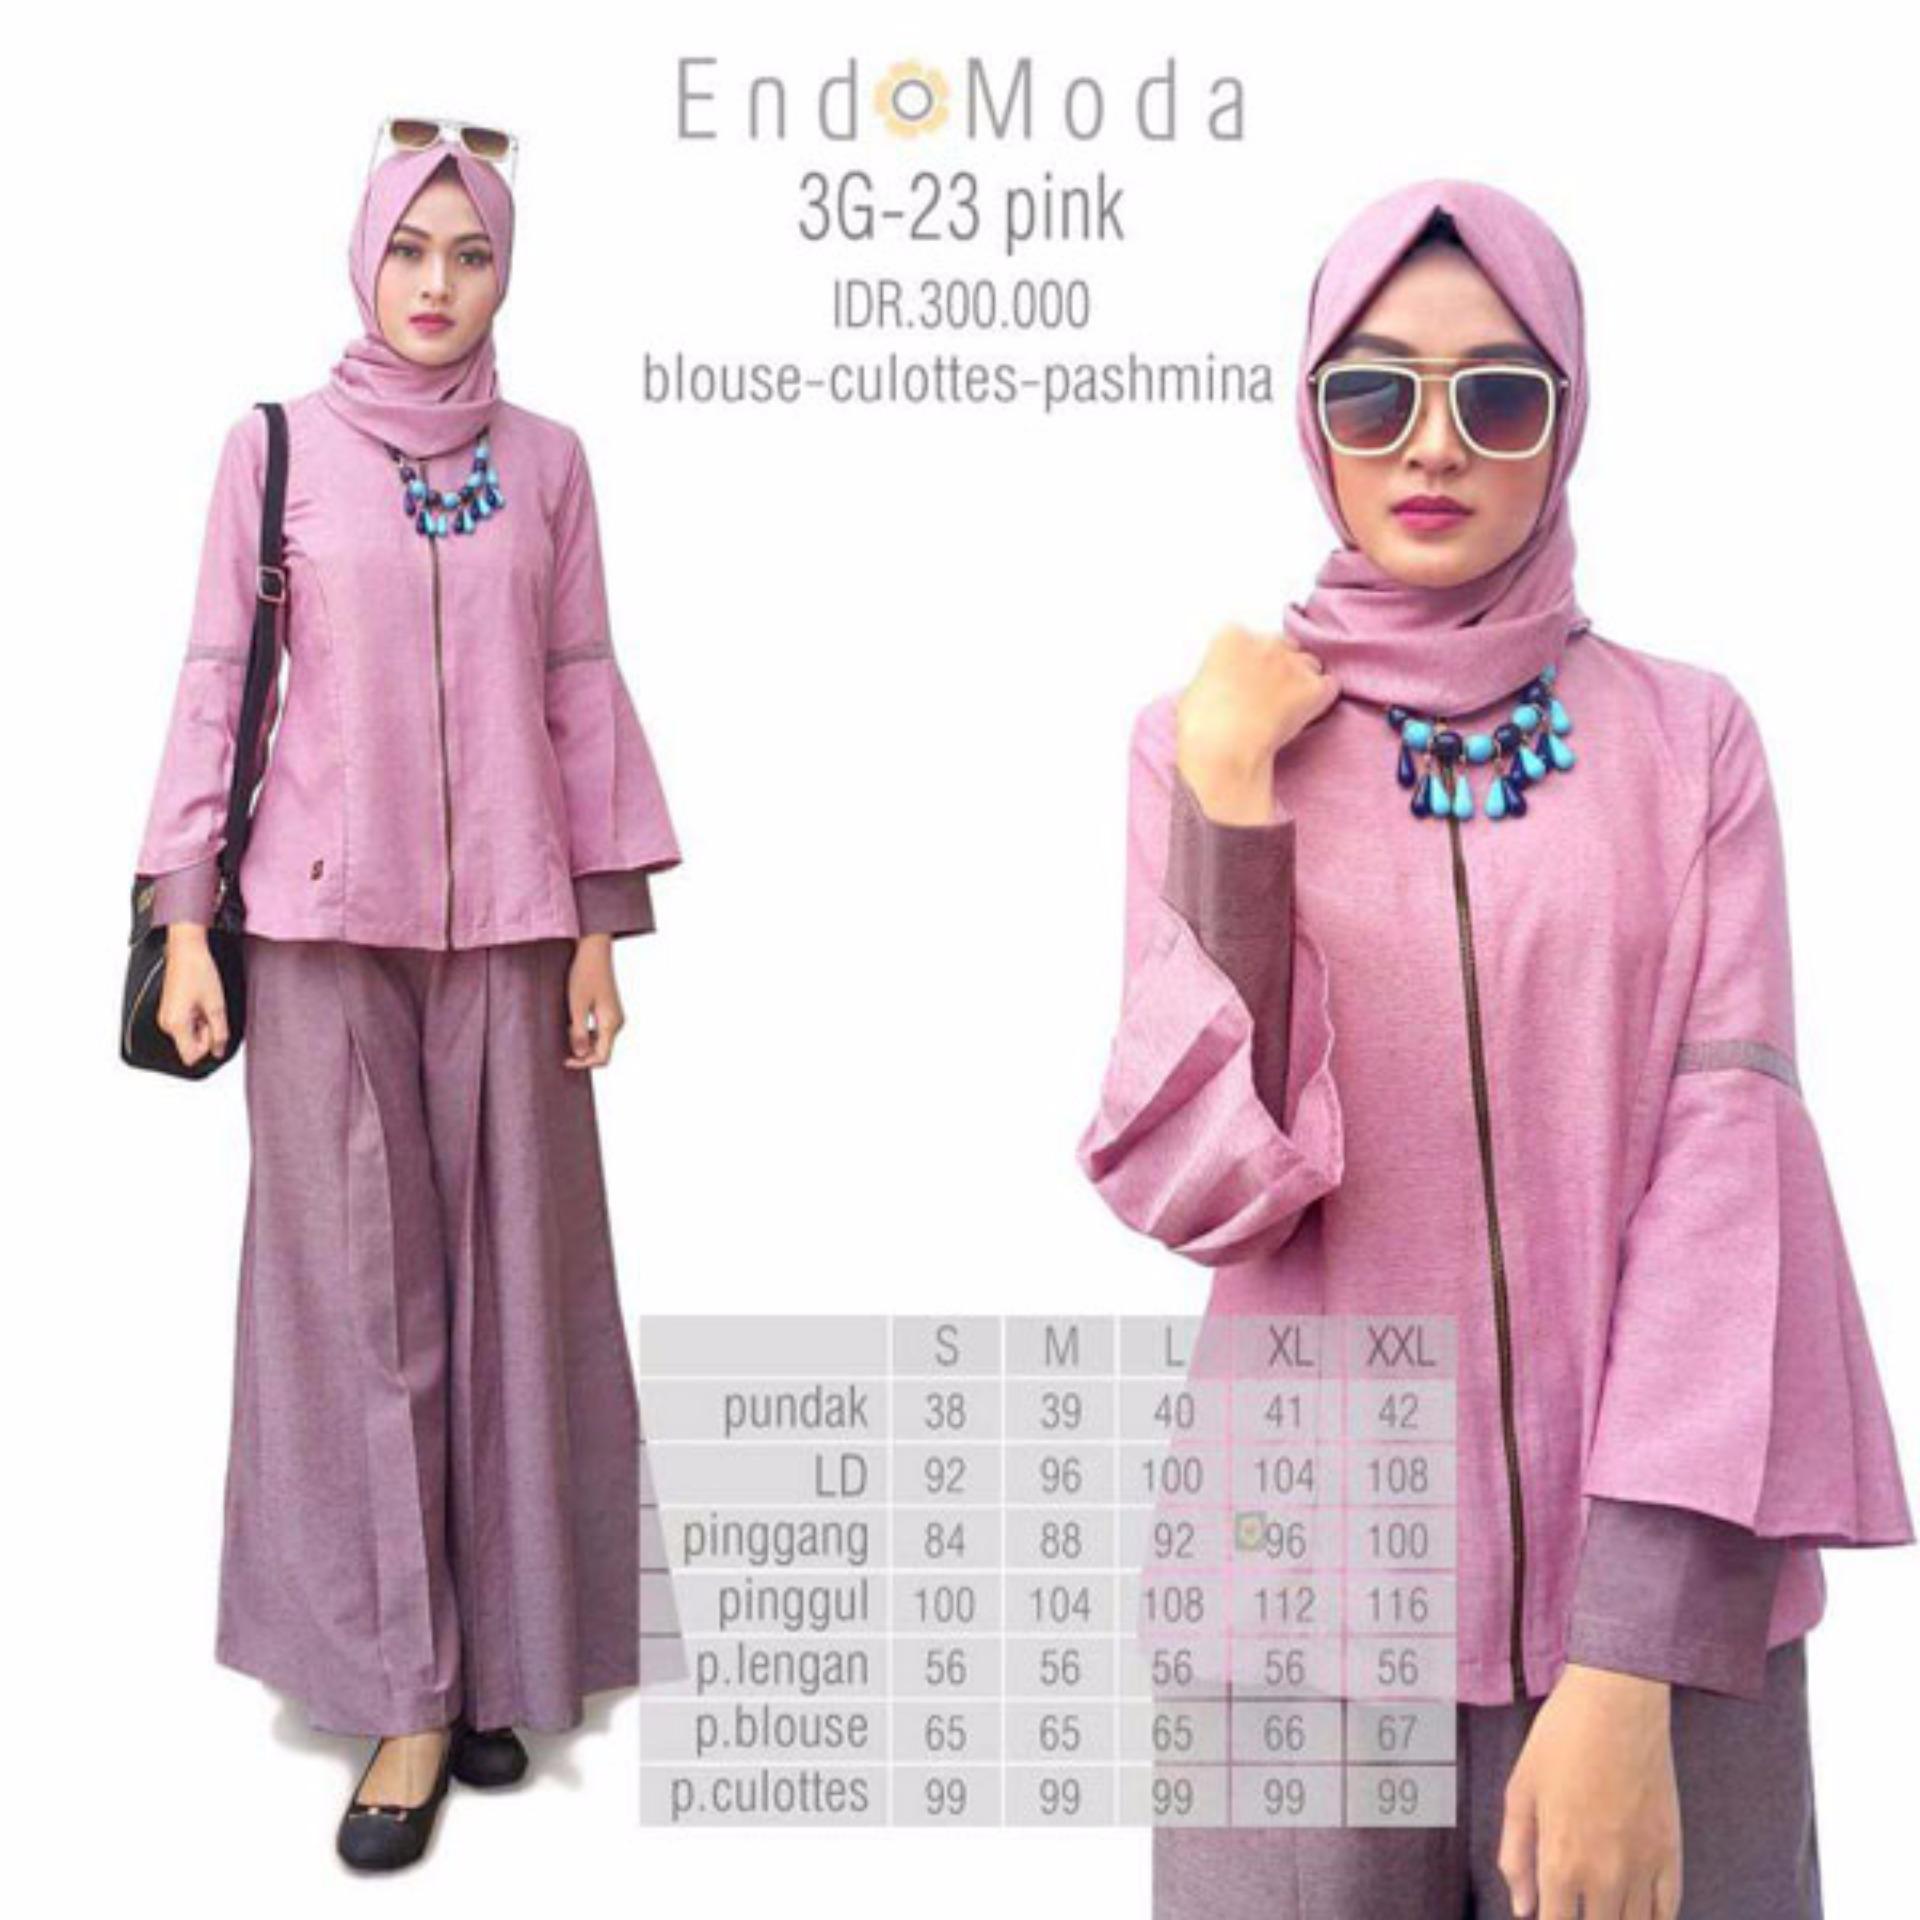 Toko Baju Original Endo Moda 3G 23 Setelanwanita Baju Muslim Modern Gamis Katun Supernova Premium Warnapink Terlengkap Di Jawa Barat